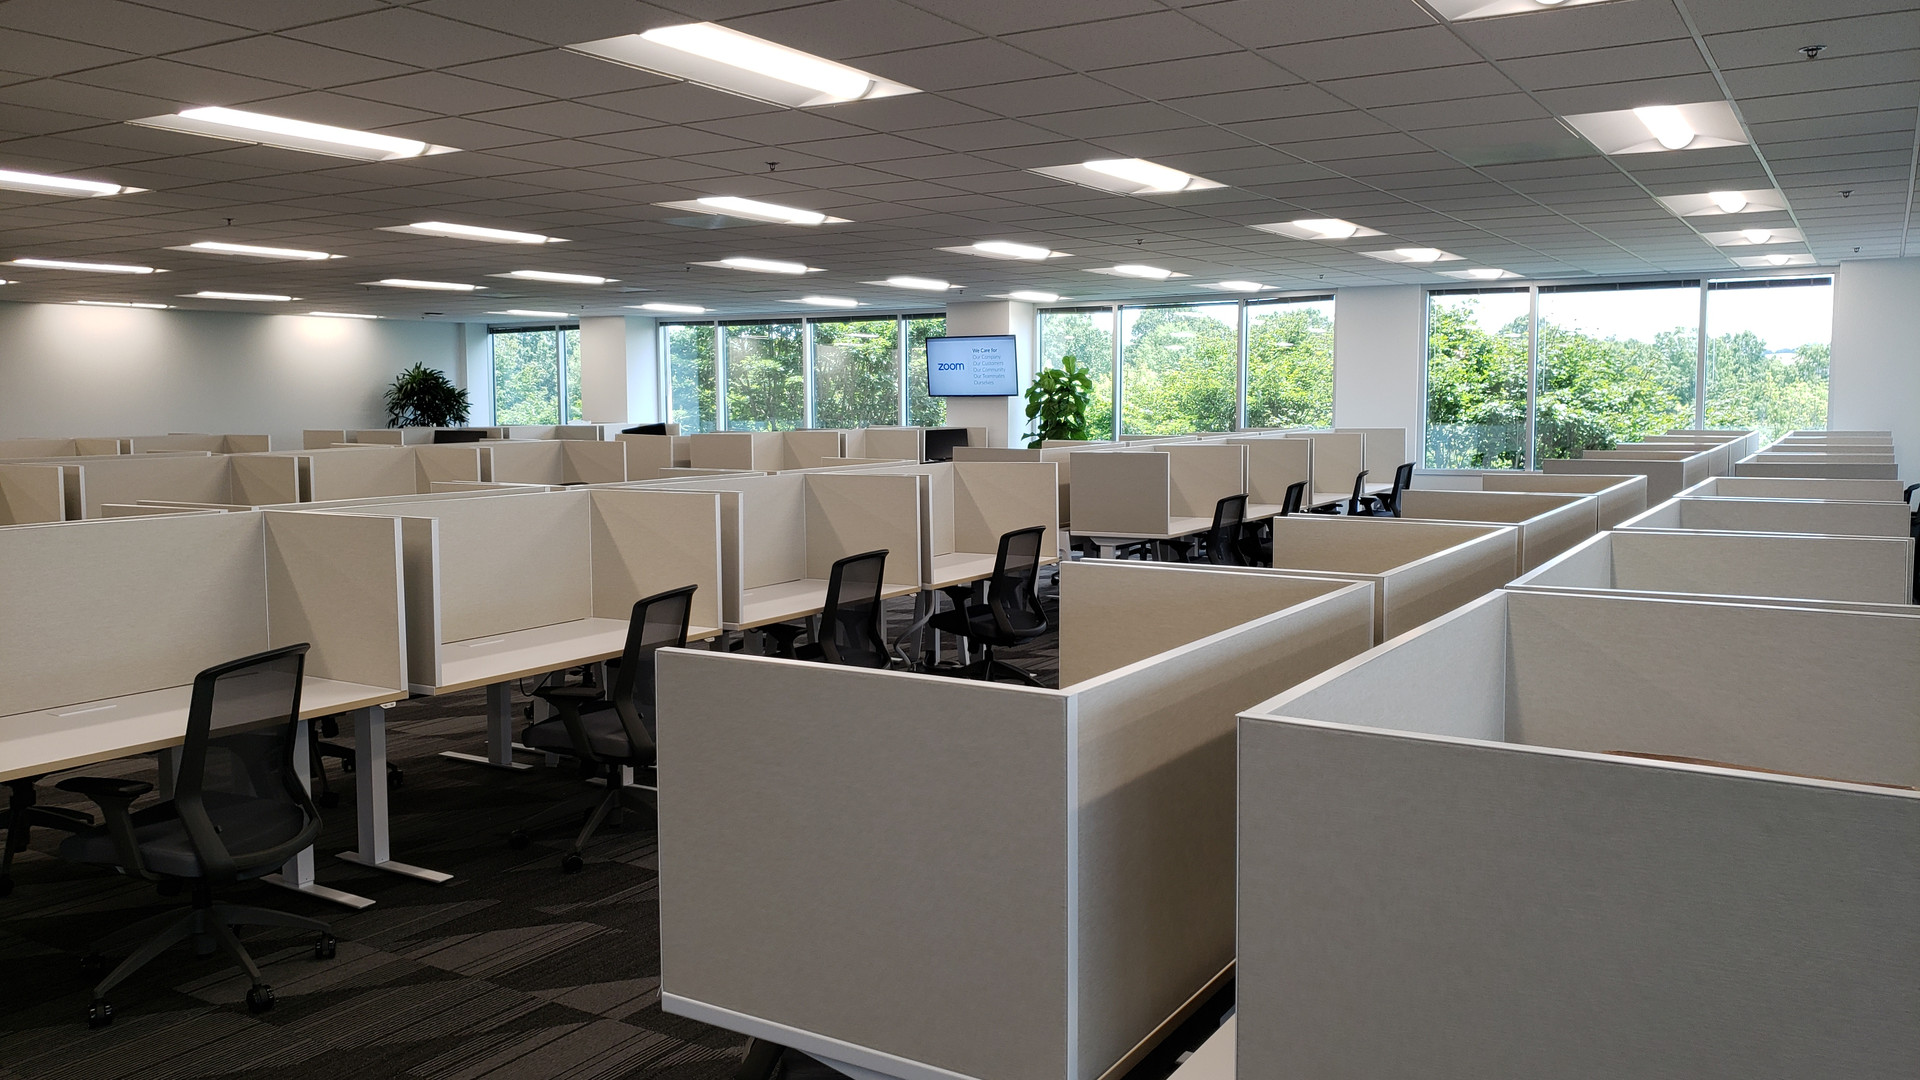 Office Desk Spread - Buildout Pros